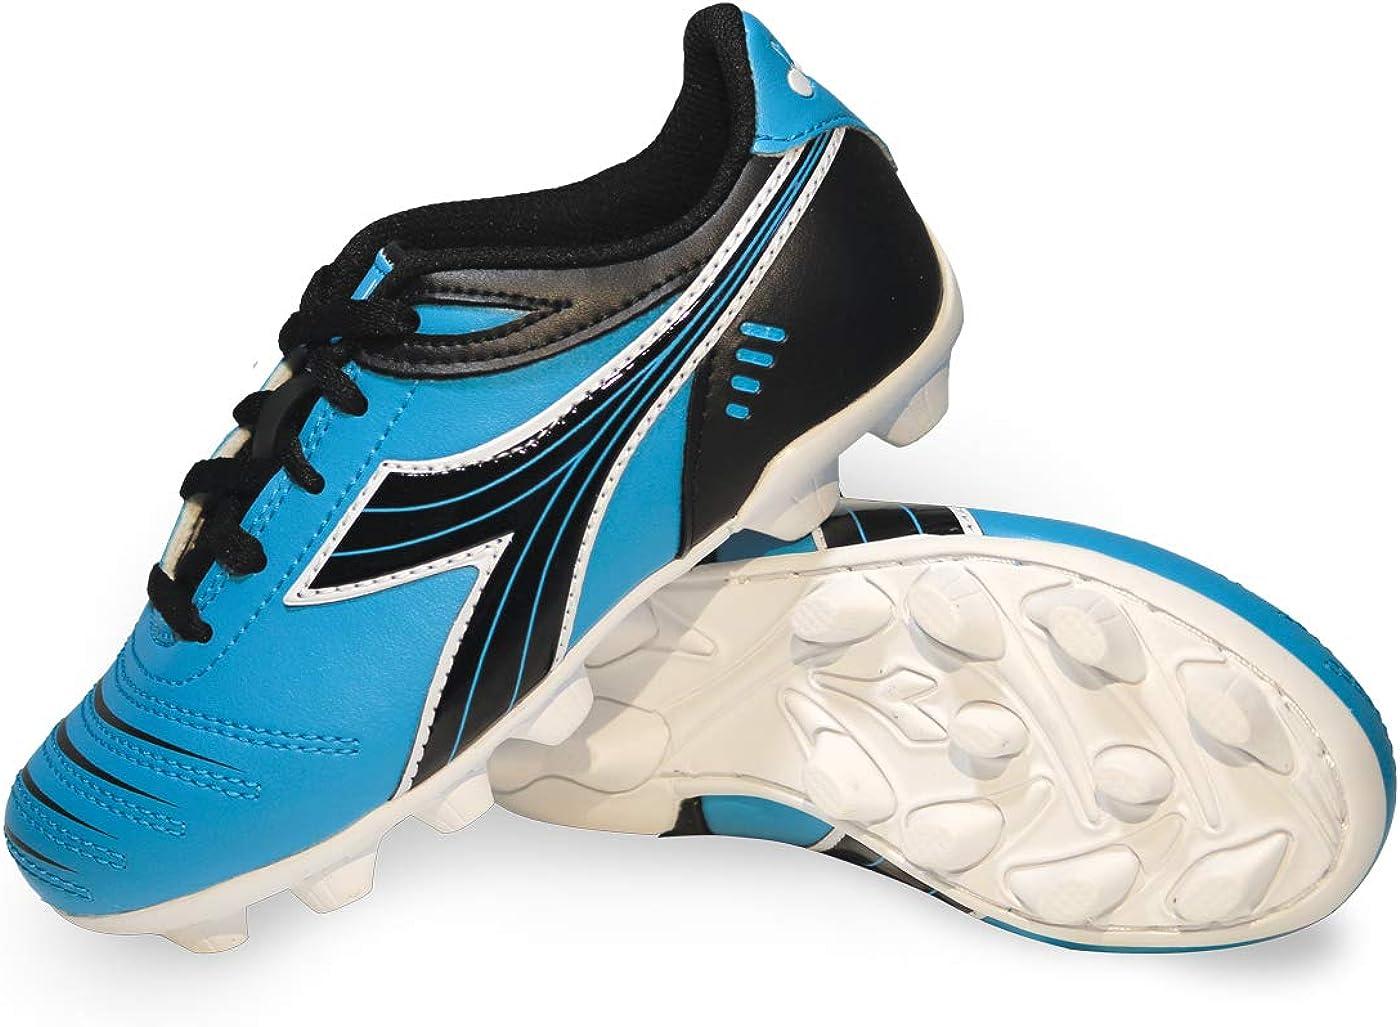 Diadora Kids' Cattura MD Jr Soccer Shoes Outdoor / Indoor Cleats